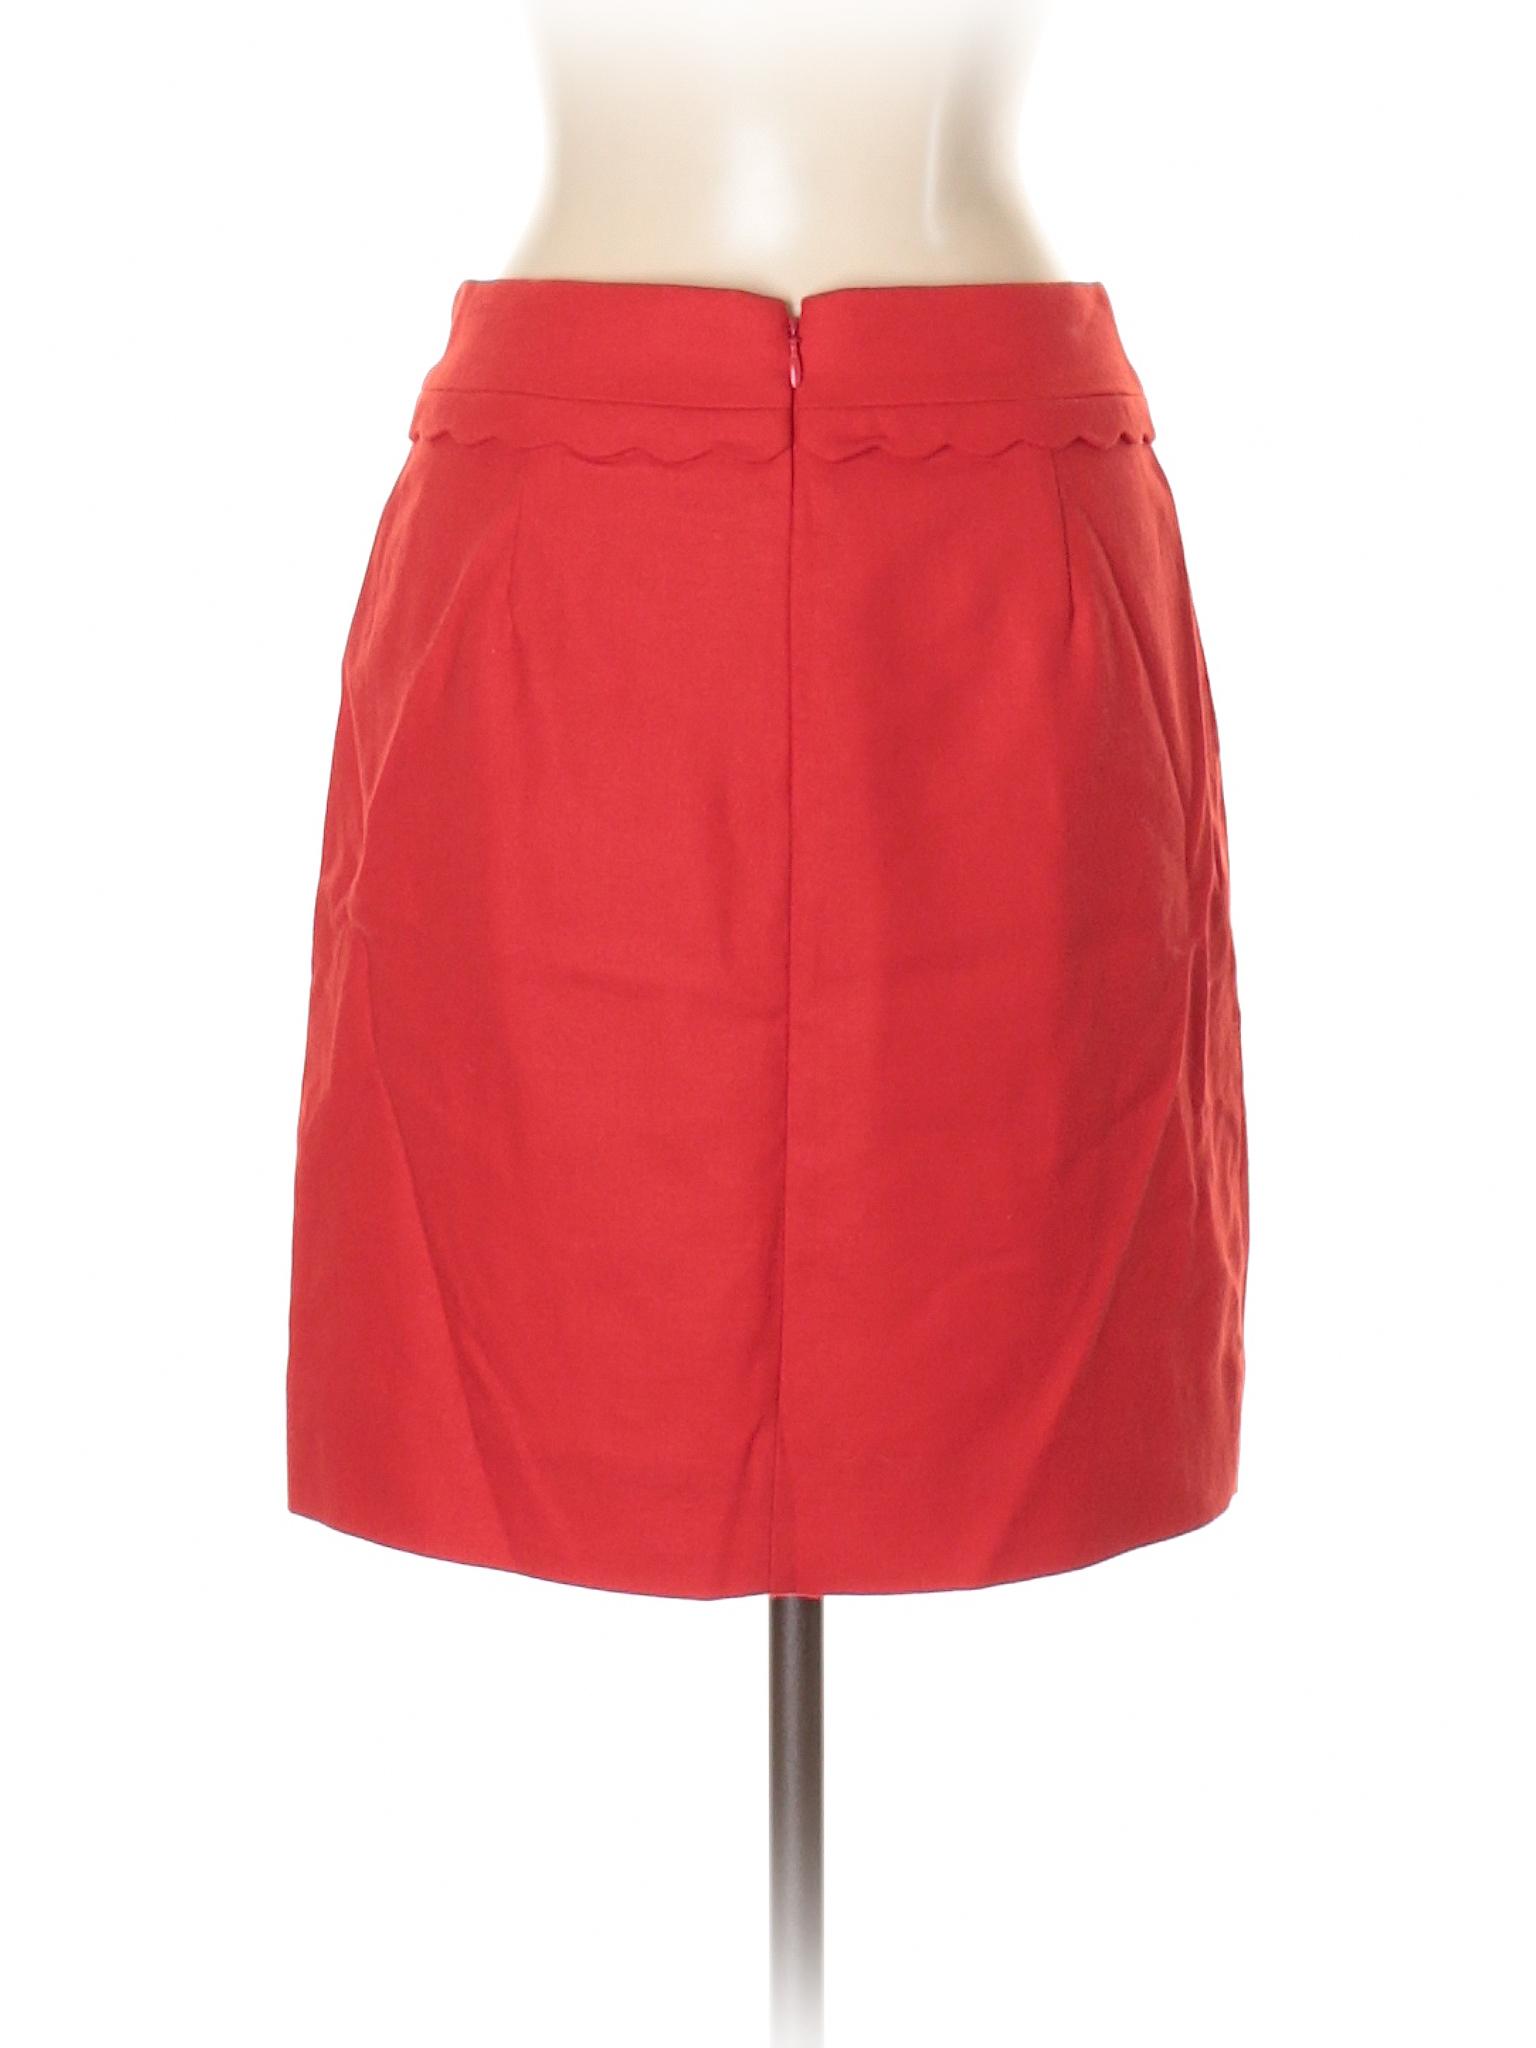 Boutique Skirt Wool Boutique Boutique Wool Wool Wool Boutique Skirt Skirt qztx6Awz